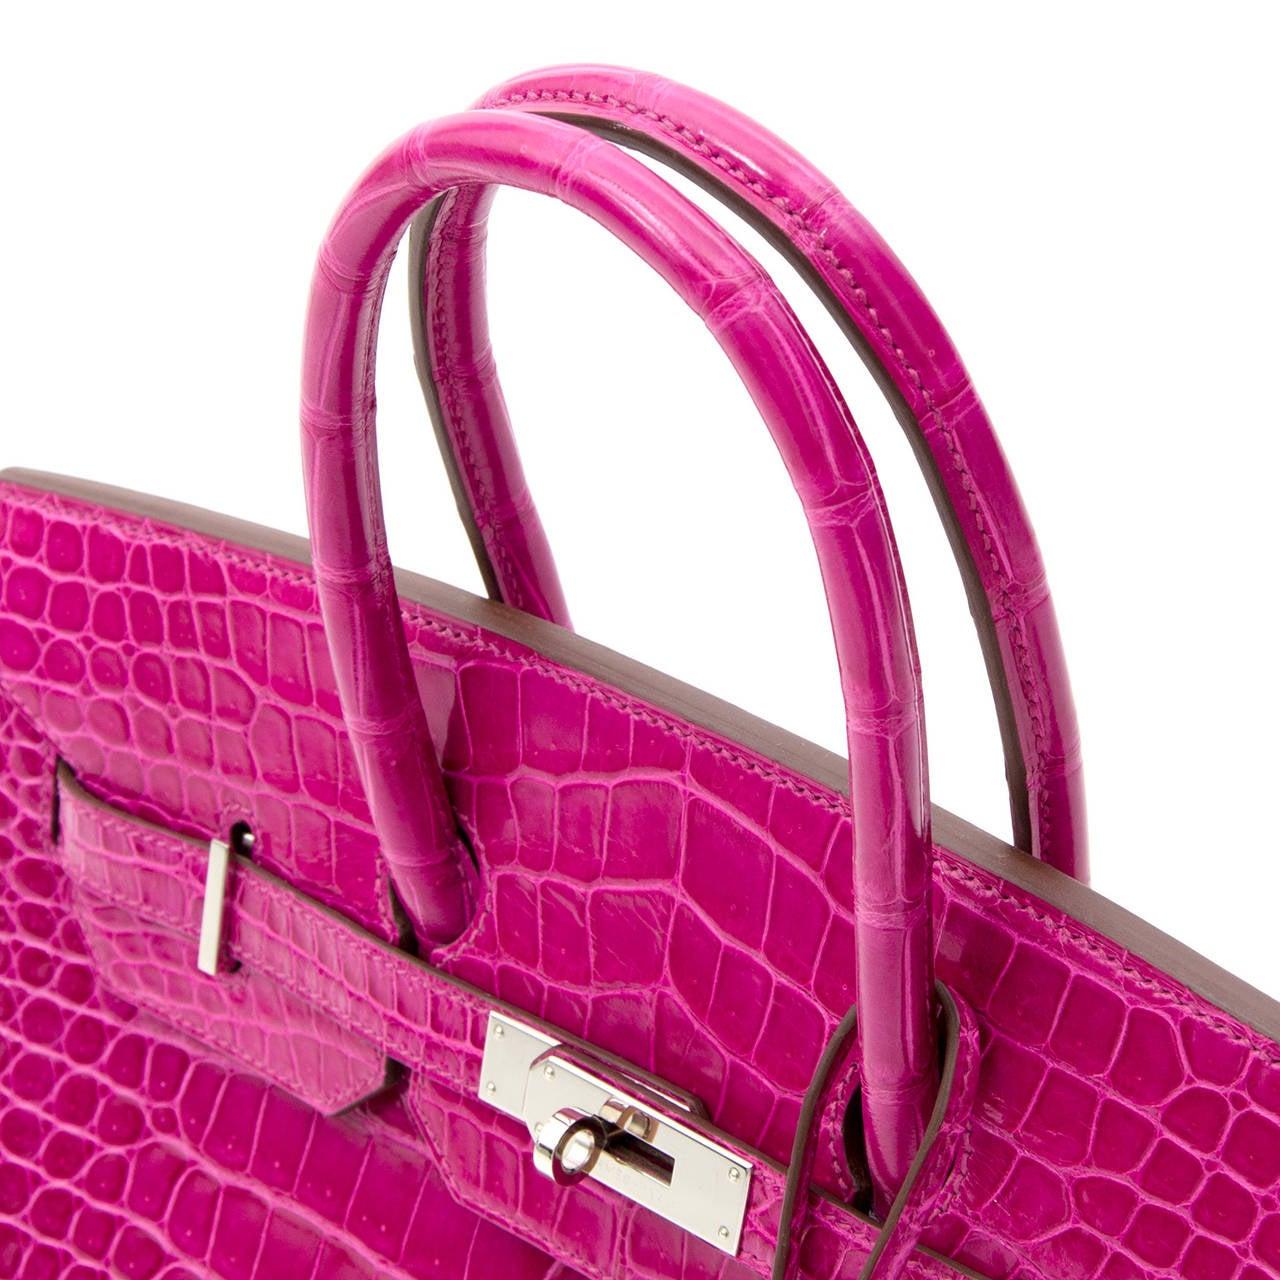 Hermès Birkin Corocodile Porosus PHW Rose Sheherazade 35 1